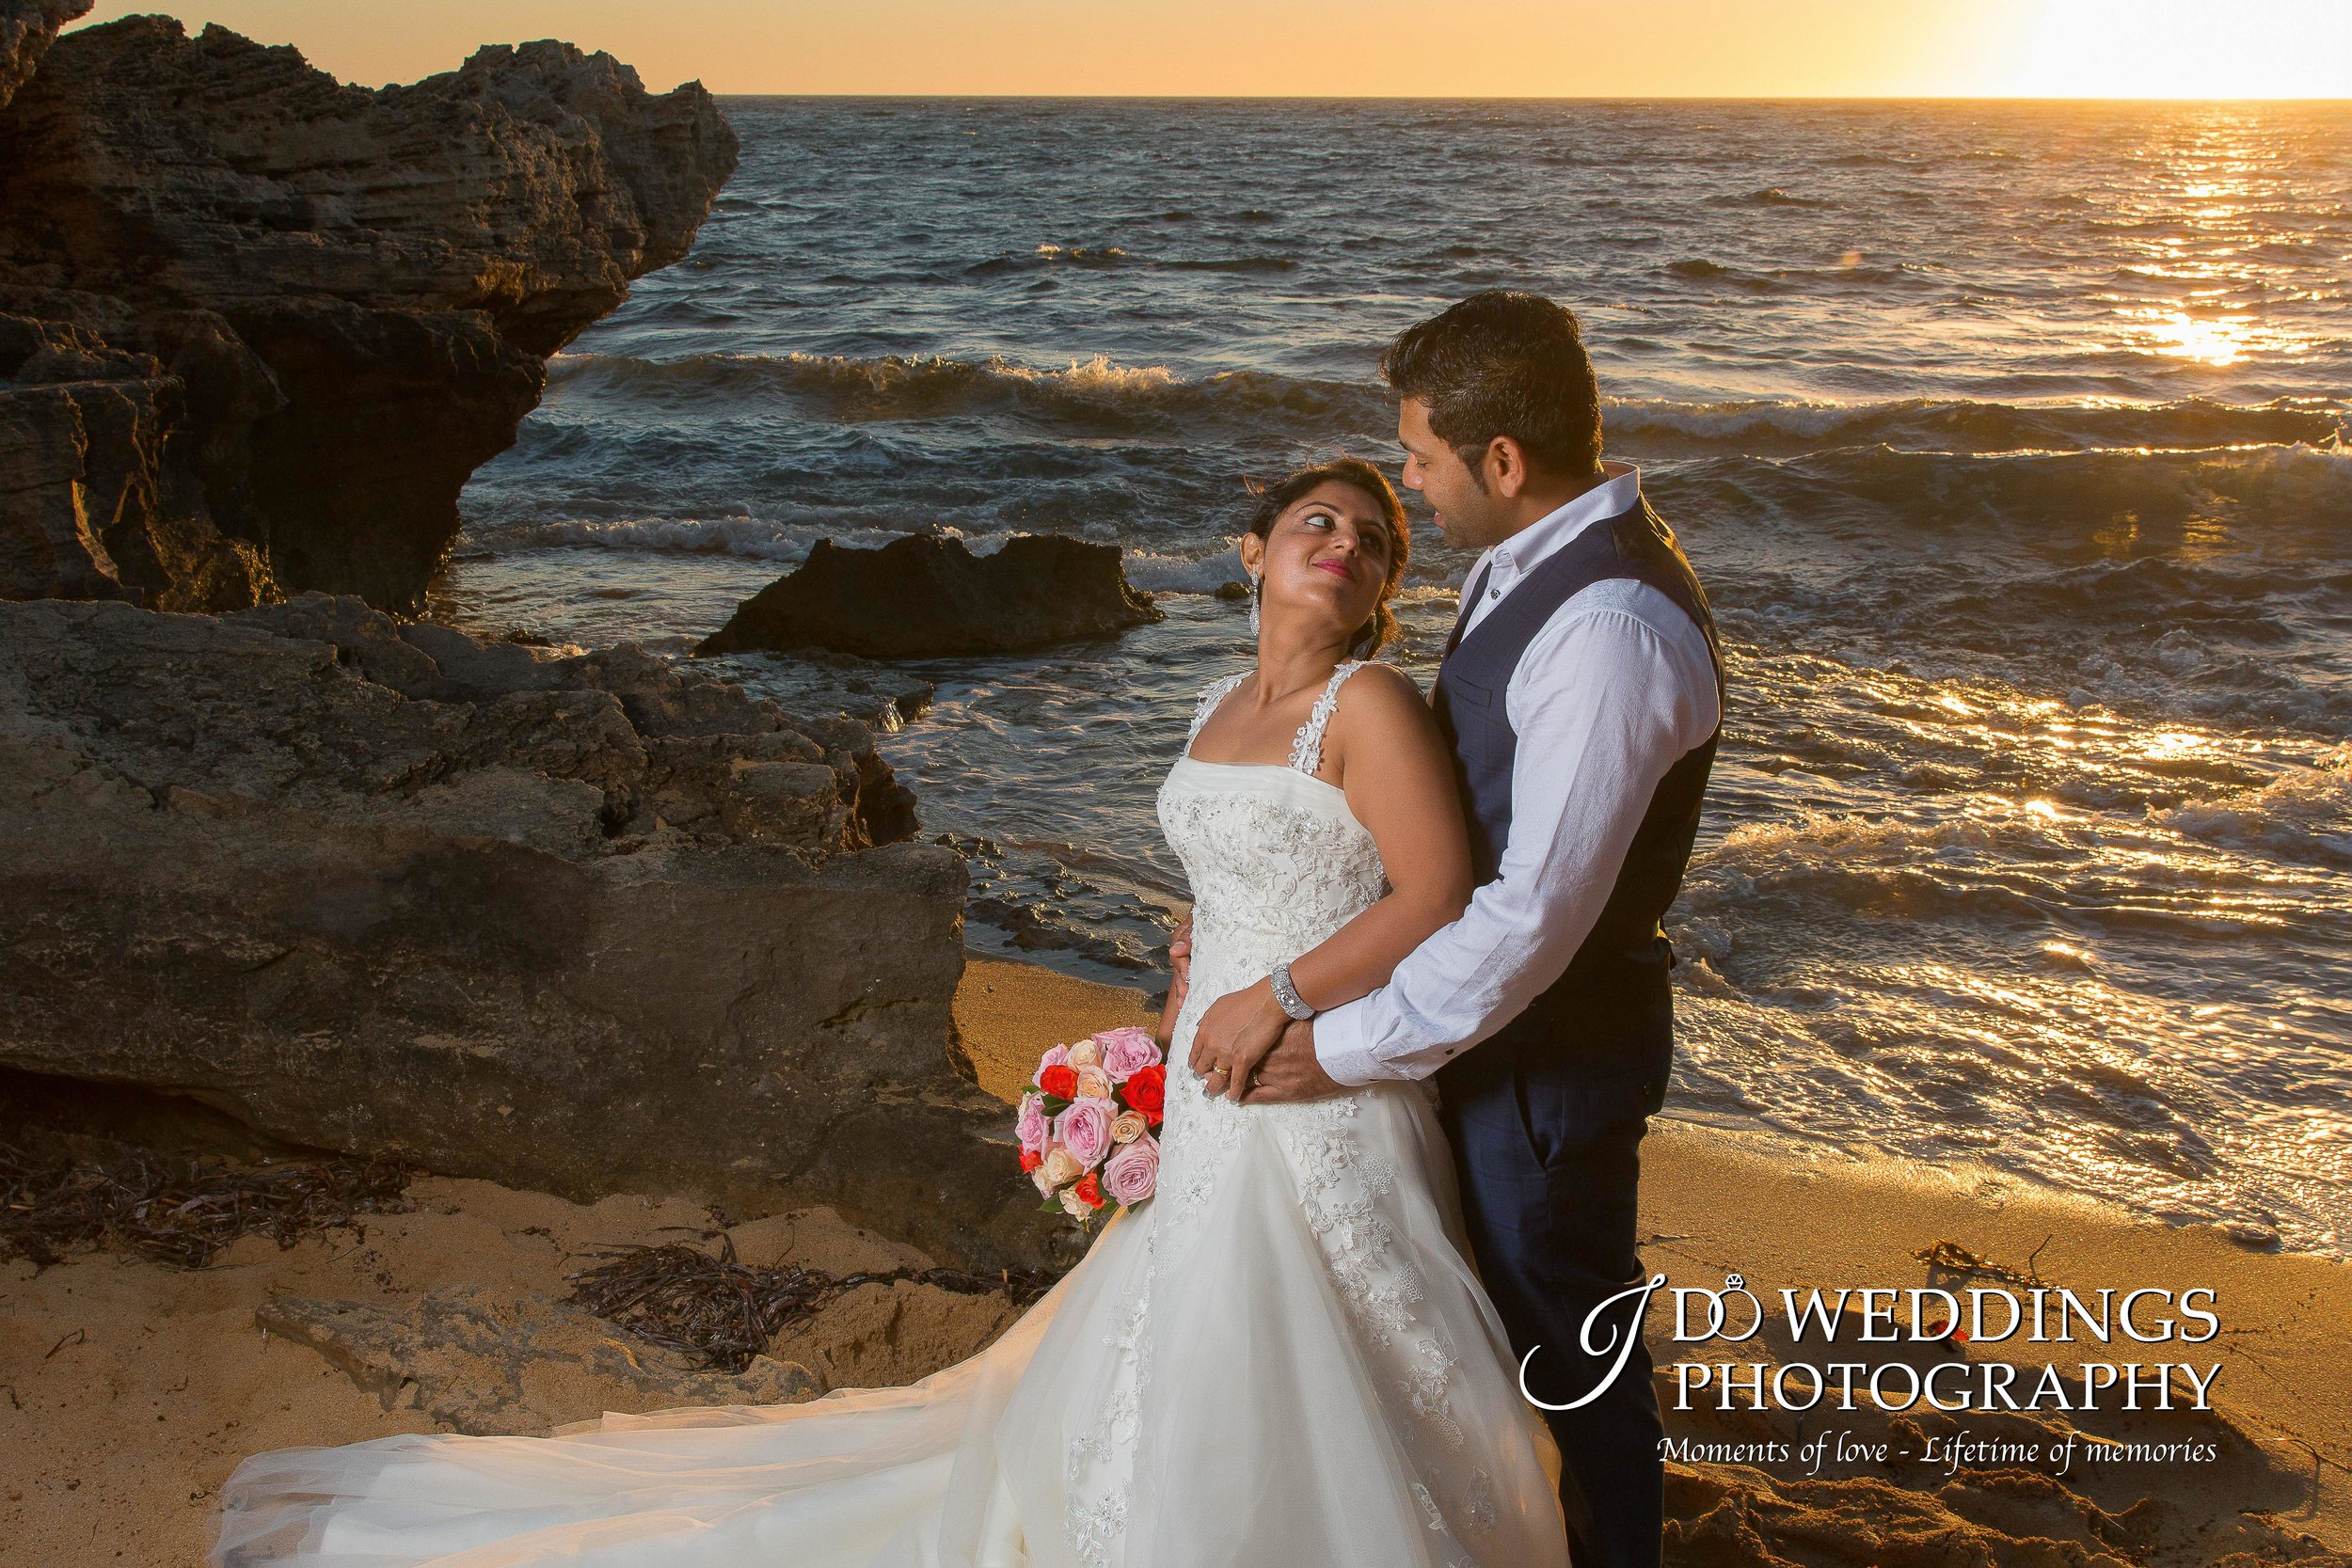 wedding images53.jpg